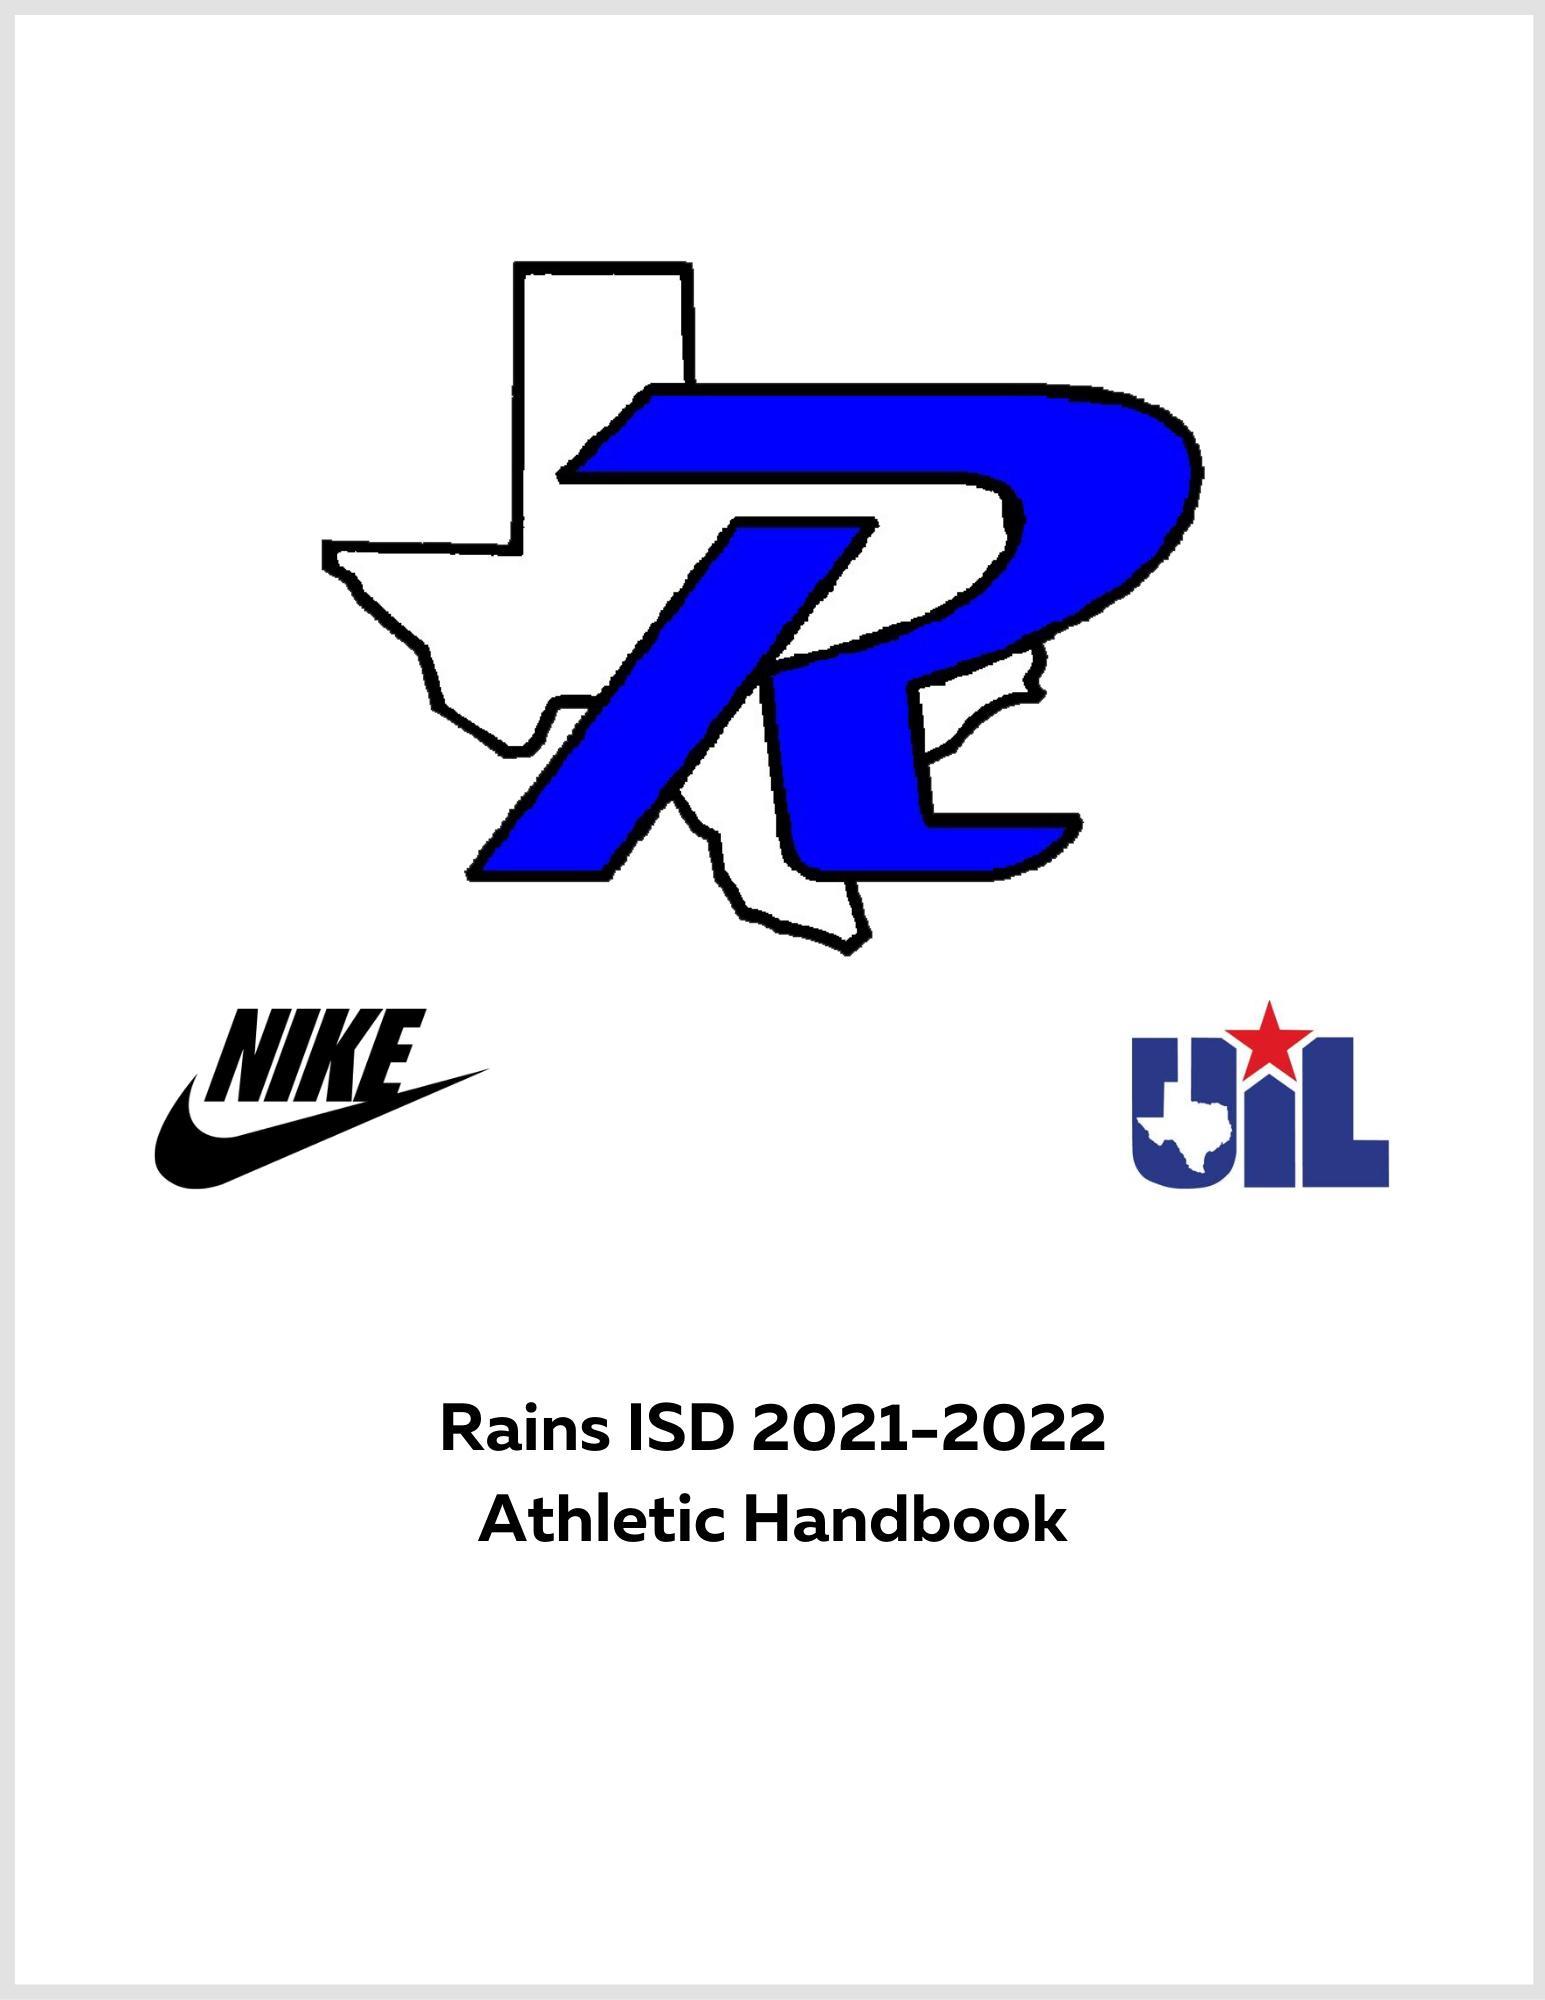 2021-2022 Rains Athletic Handbook Cover